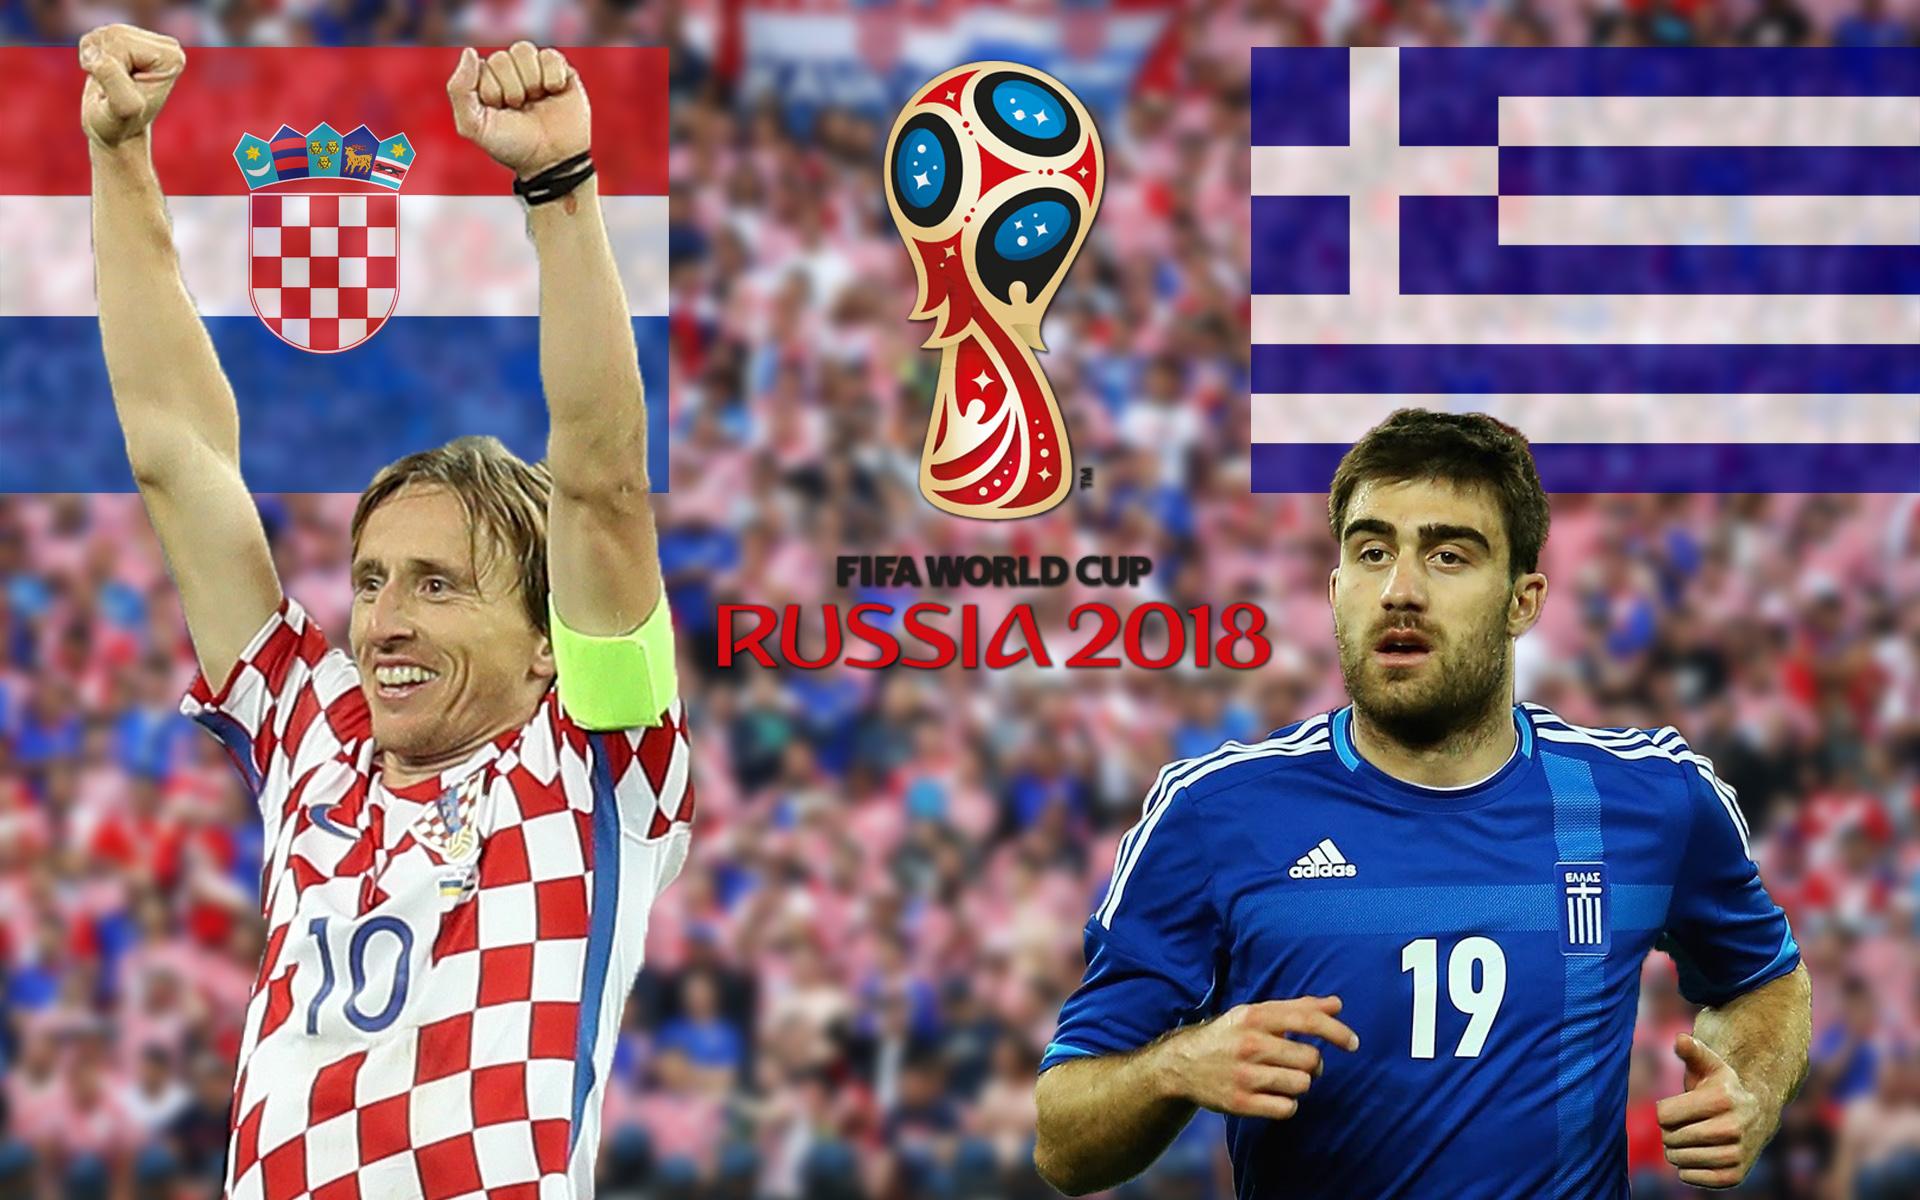 UŽIVO: HRVATSKA VODI 4:1!!! Festival golova na Maksimiru, Grčka nema odgovora na 'Vatrene'